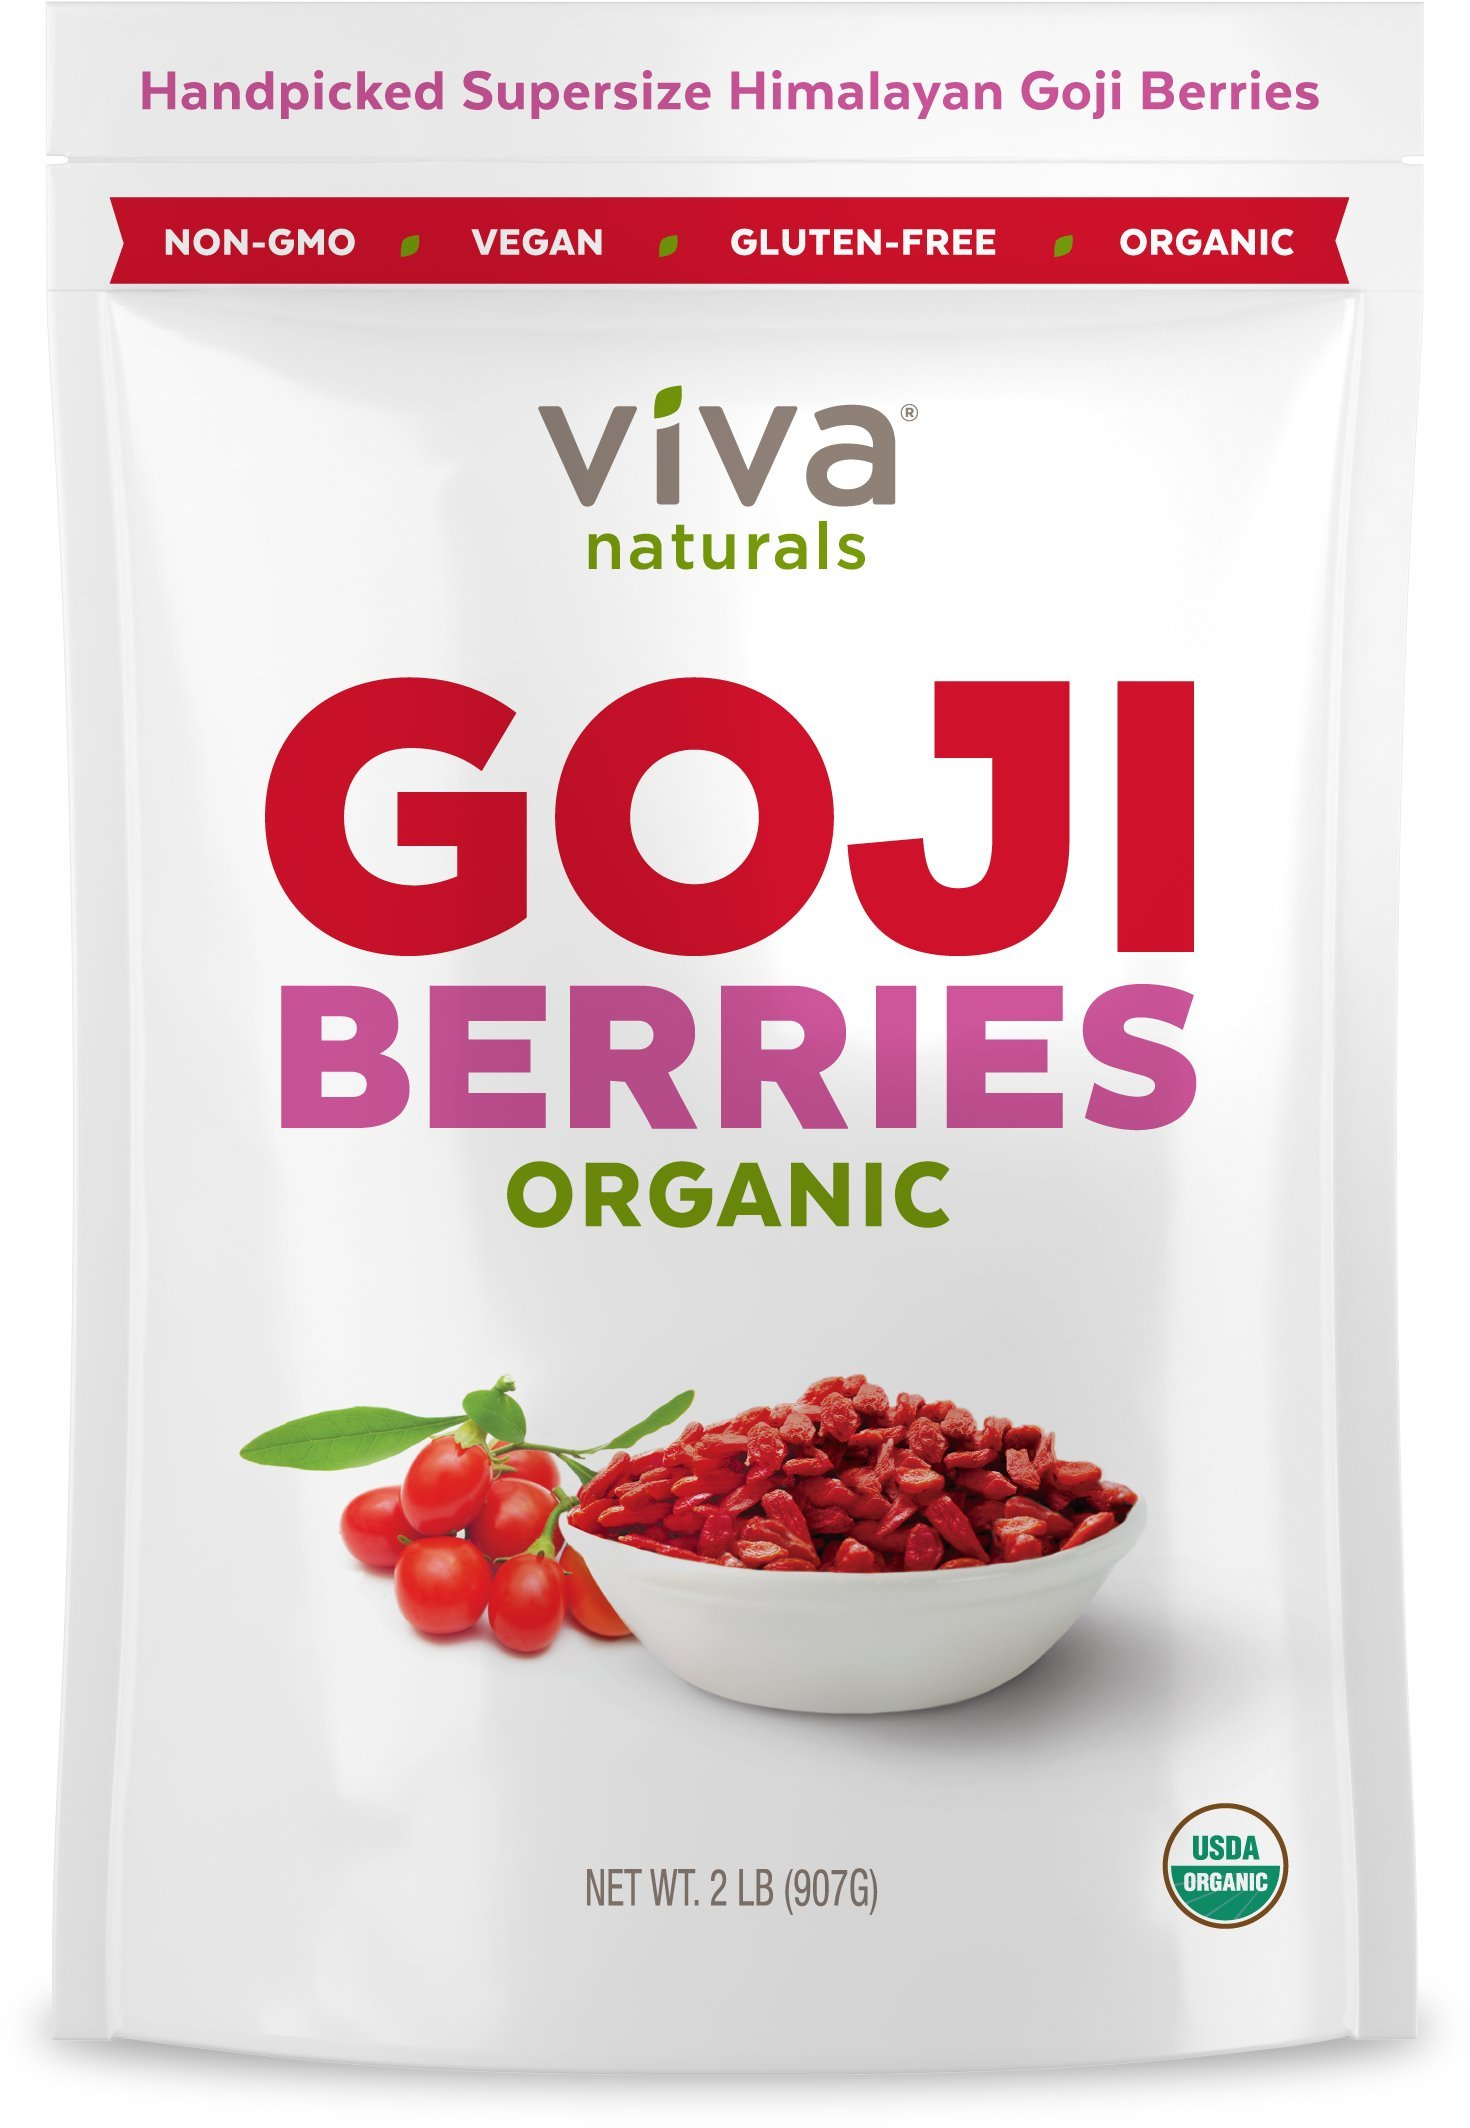 Viva Naturals #1 Premium Himalayan Organic Goji Berries, Noticeably Larger and Juicier, 2lb bag